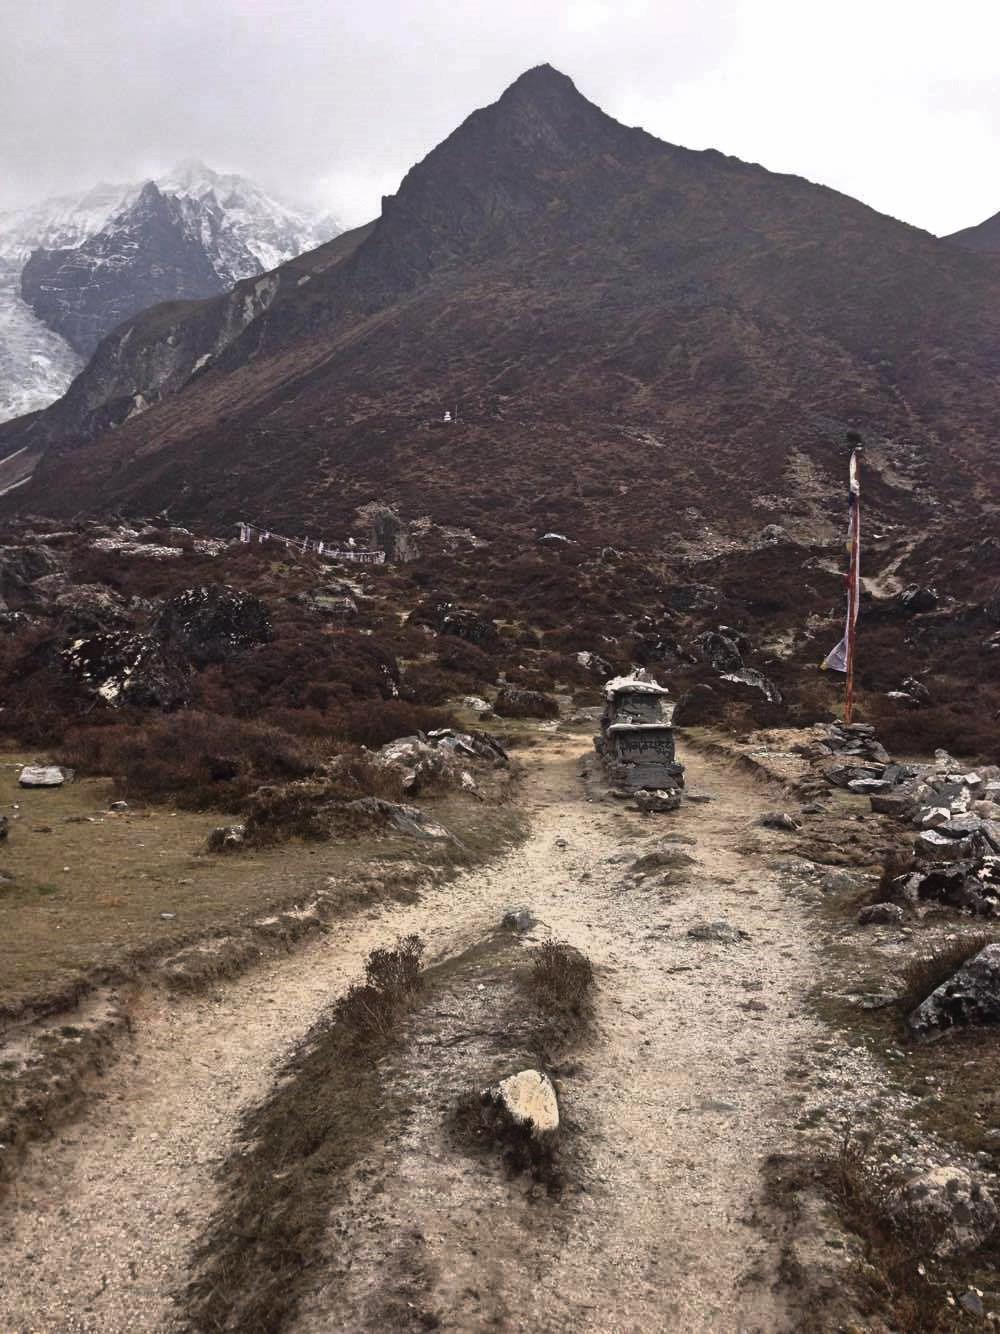 Cloudy day during Langtang Valley Trek